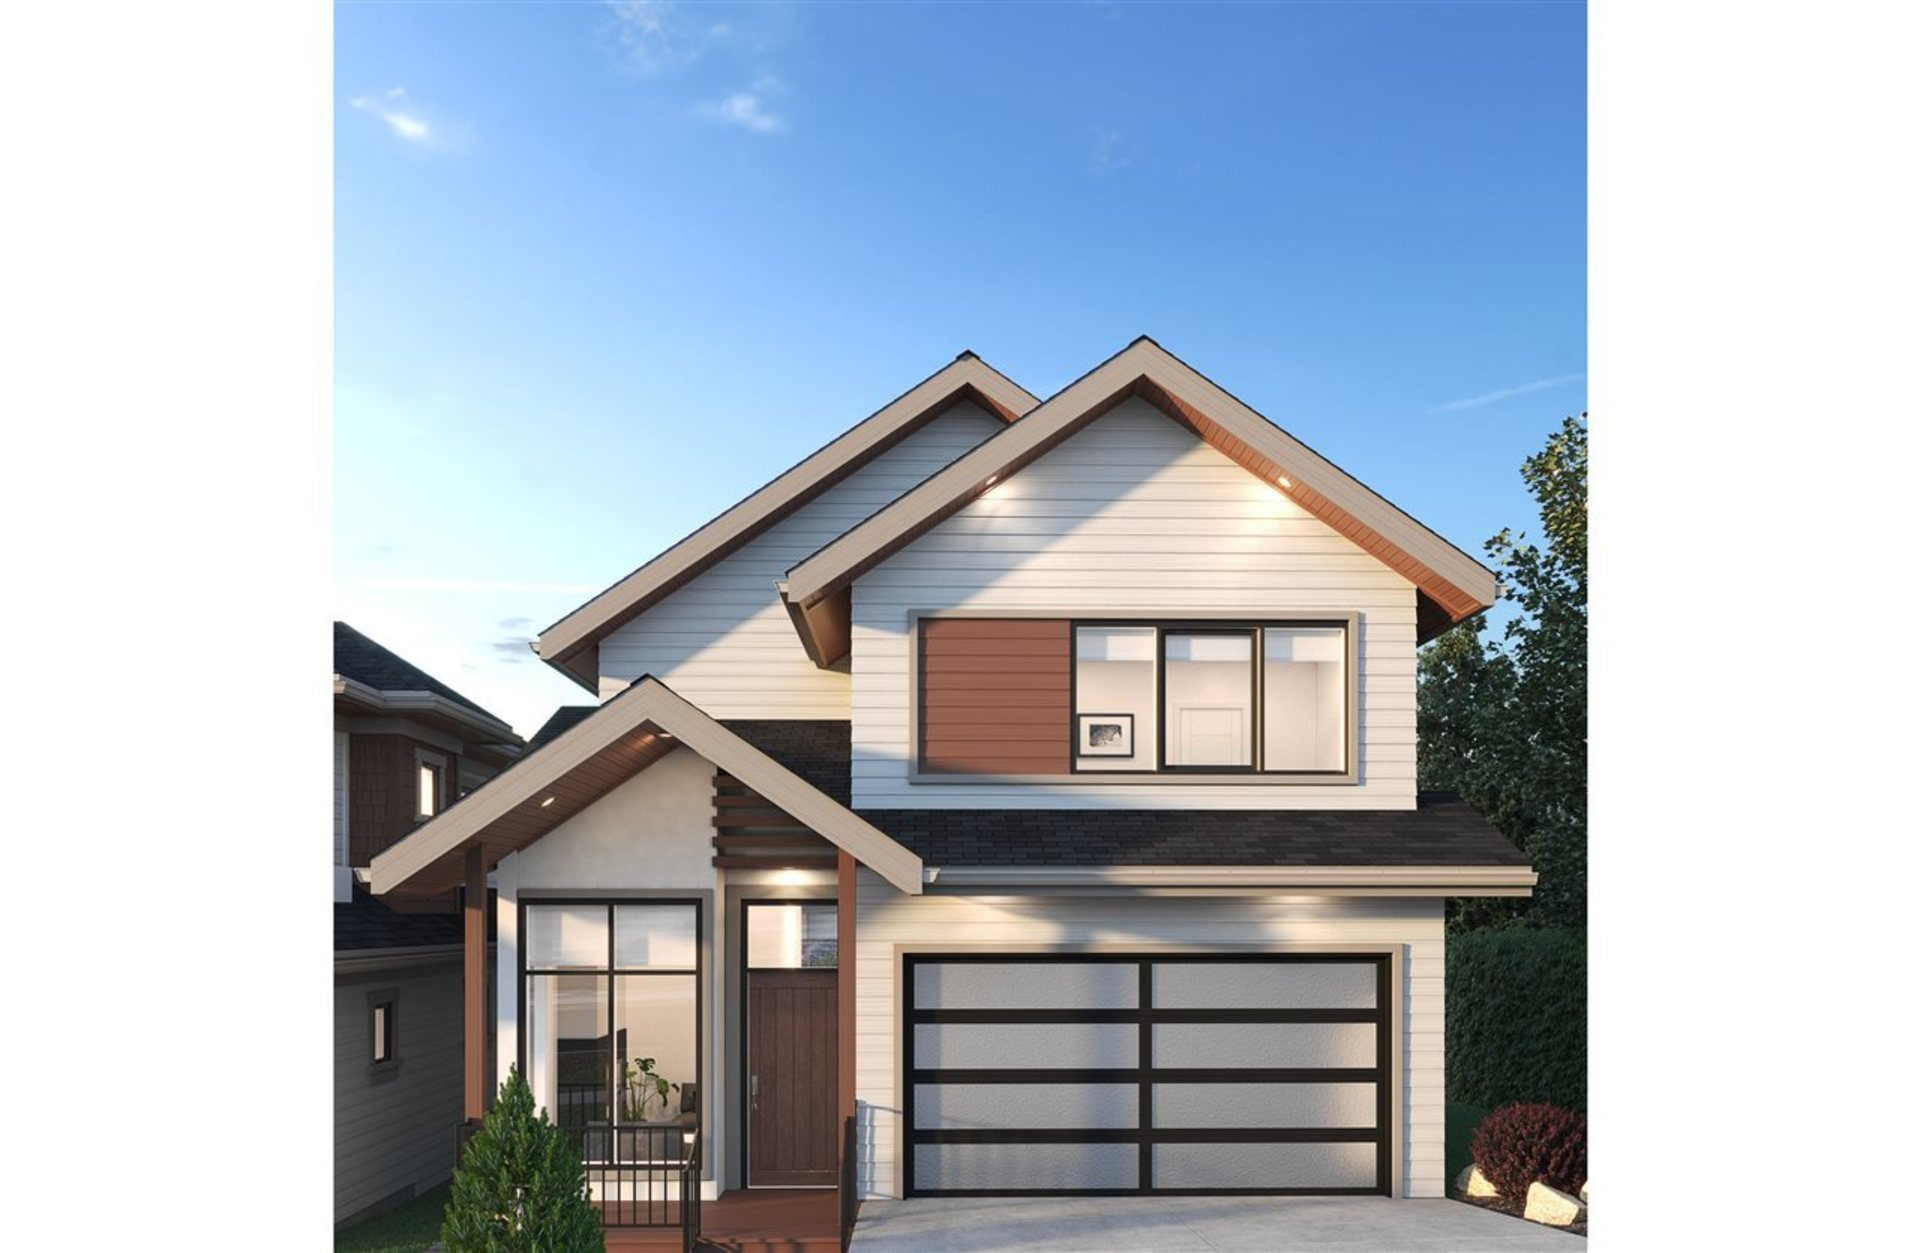 16025-28-avenue-grandview-surrey-south-surrey-white-rock-01 at 16025 28 Avenue, Grandview Surrey, South Surrey White Rock